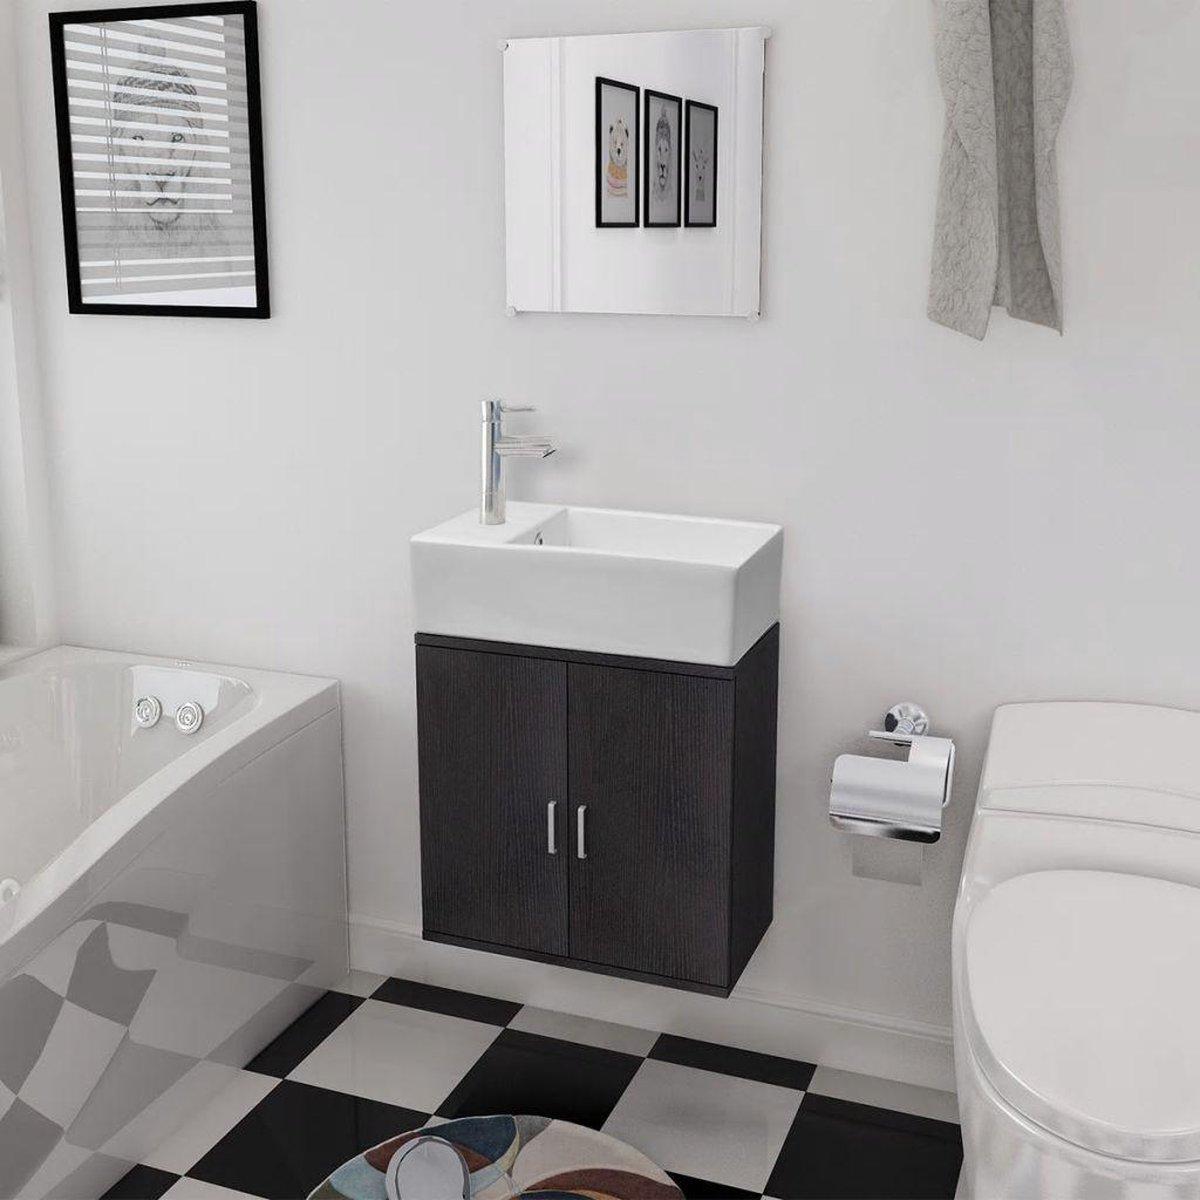 Badkamermeubelset met wasbak zwart 3-dlg